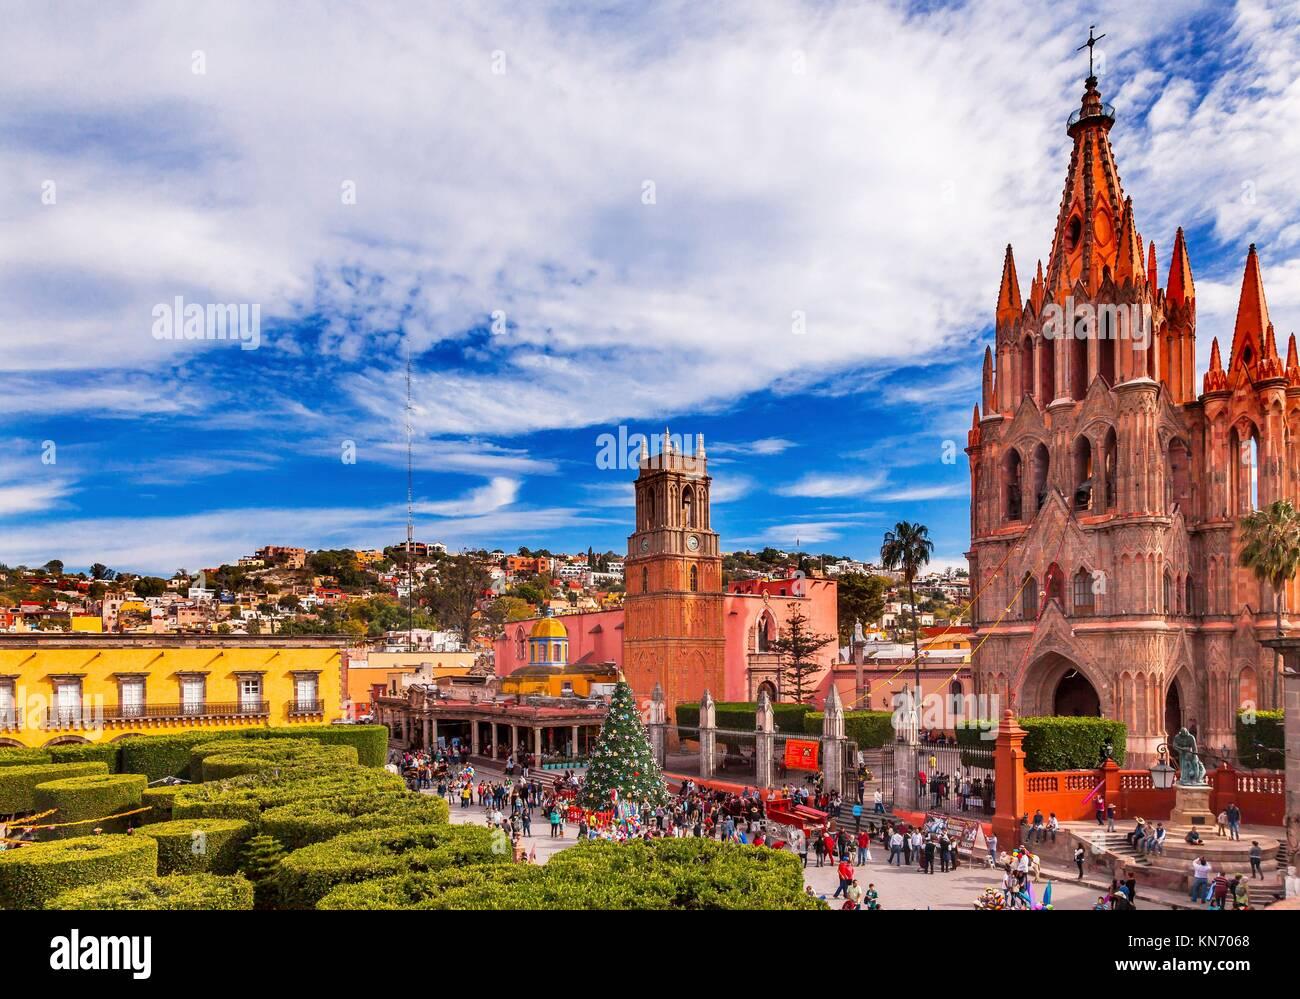 Parroquia Archangel church Jardin Town Square San Miguel de Allende, Mexico. Parroaguia created in 1600s.. - Stock Image